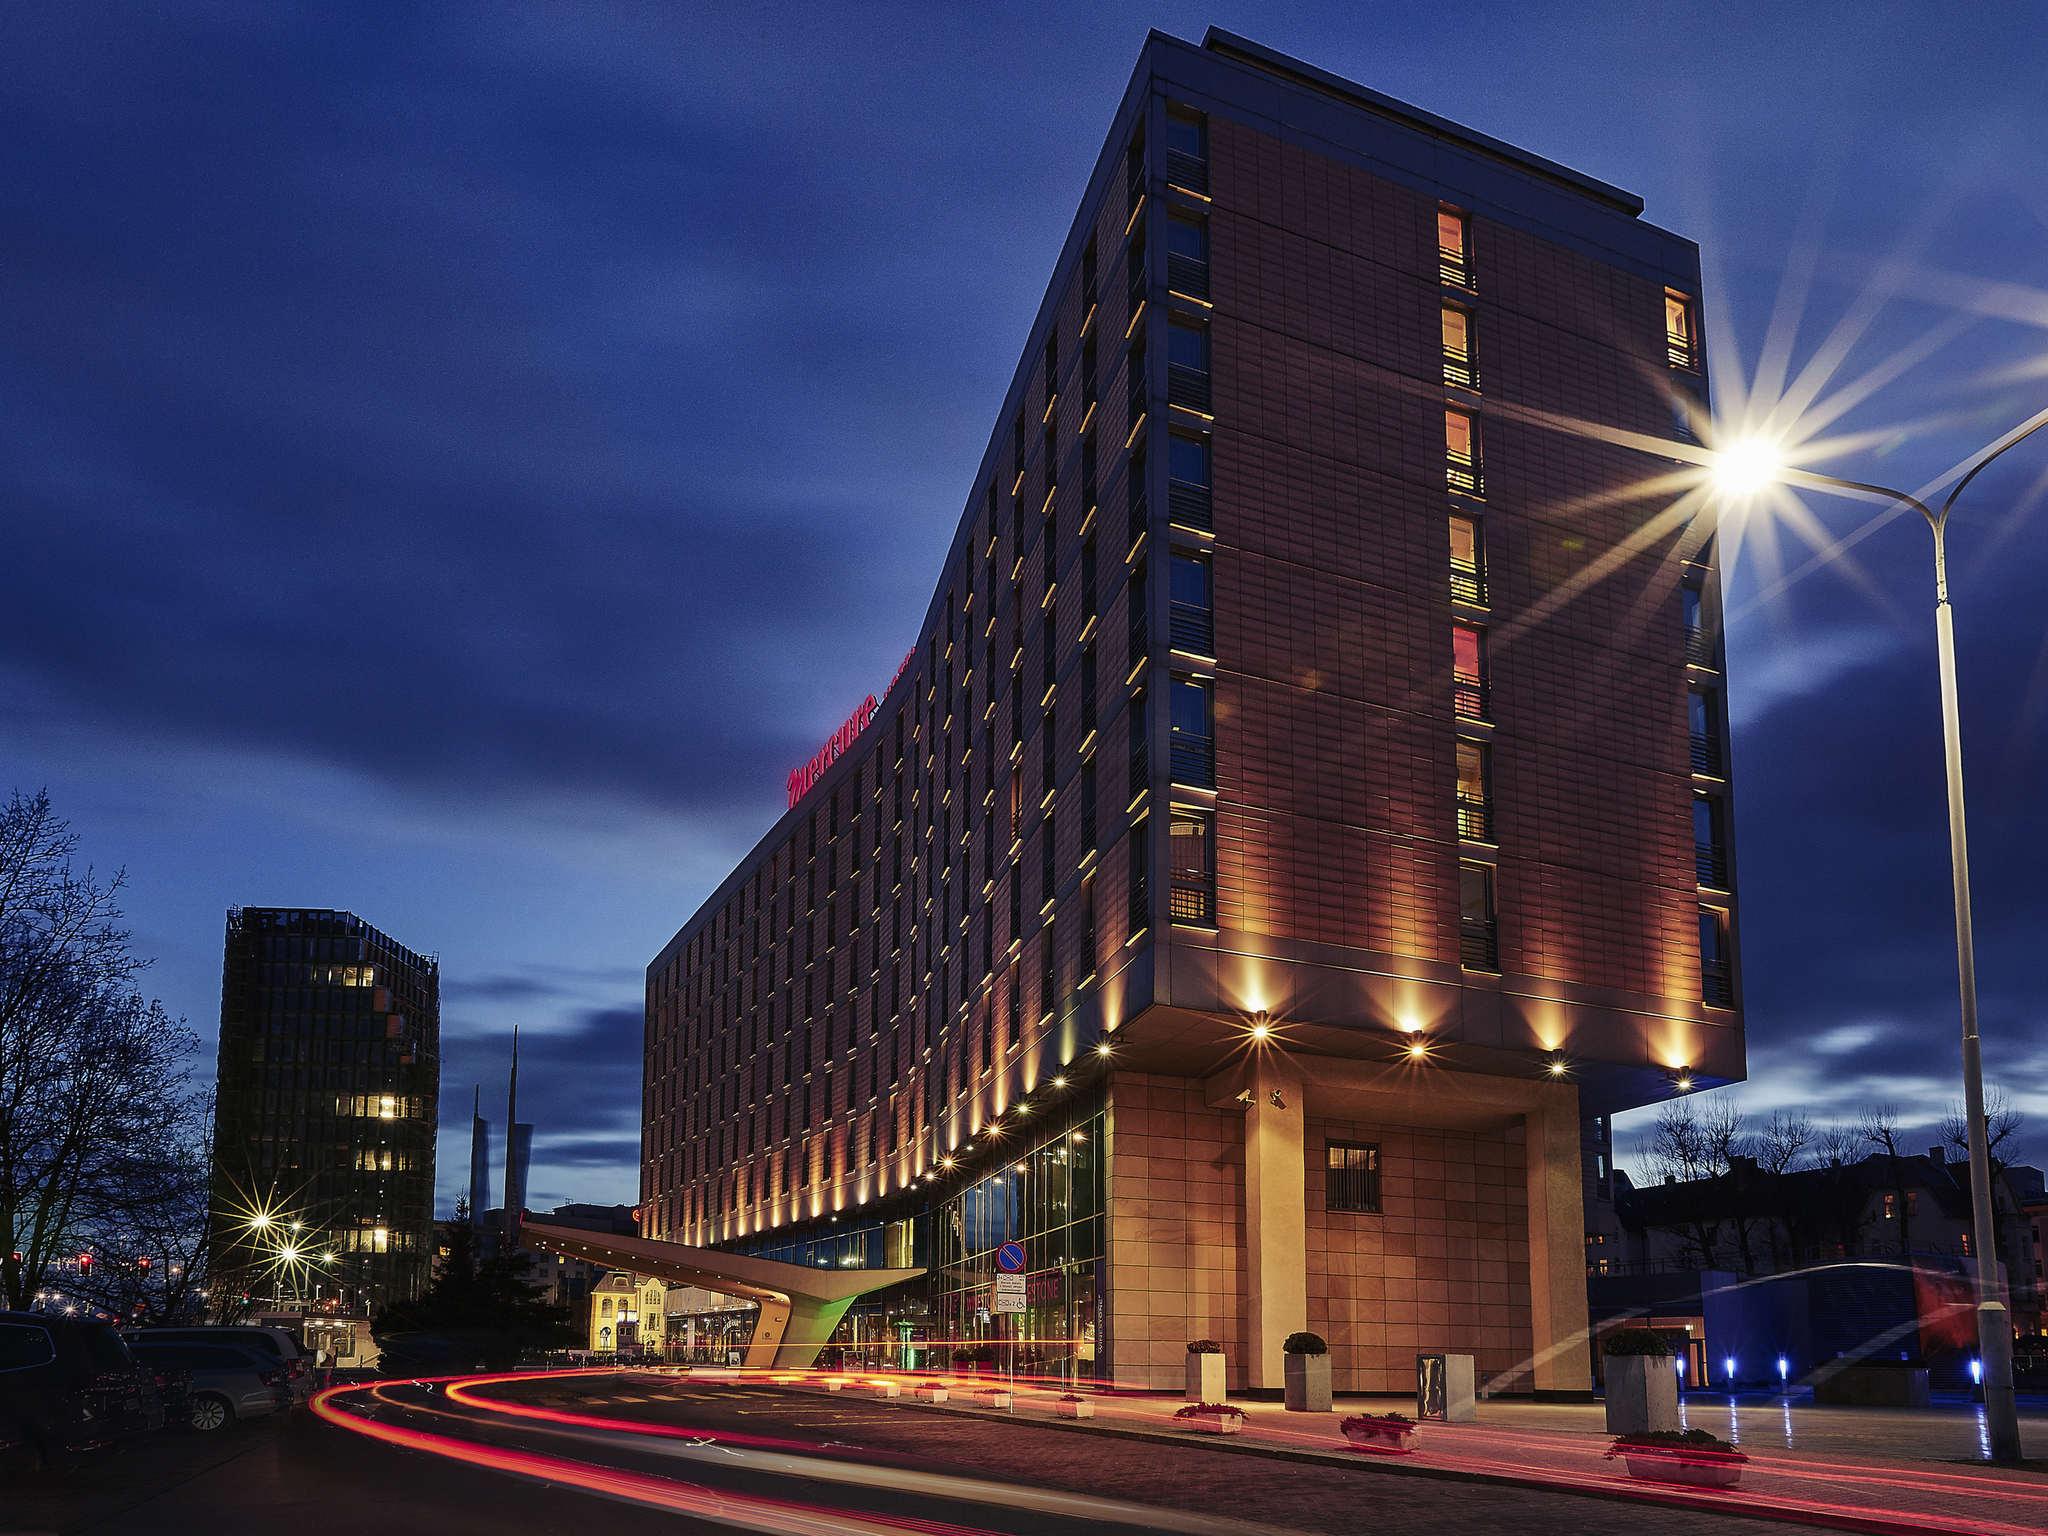 Hotell – Hotel Mercure Poznan Centrum